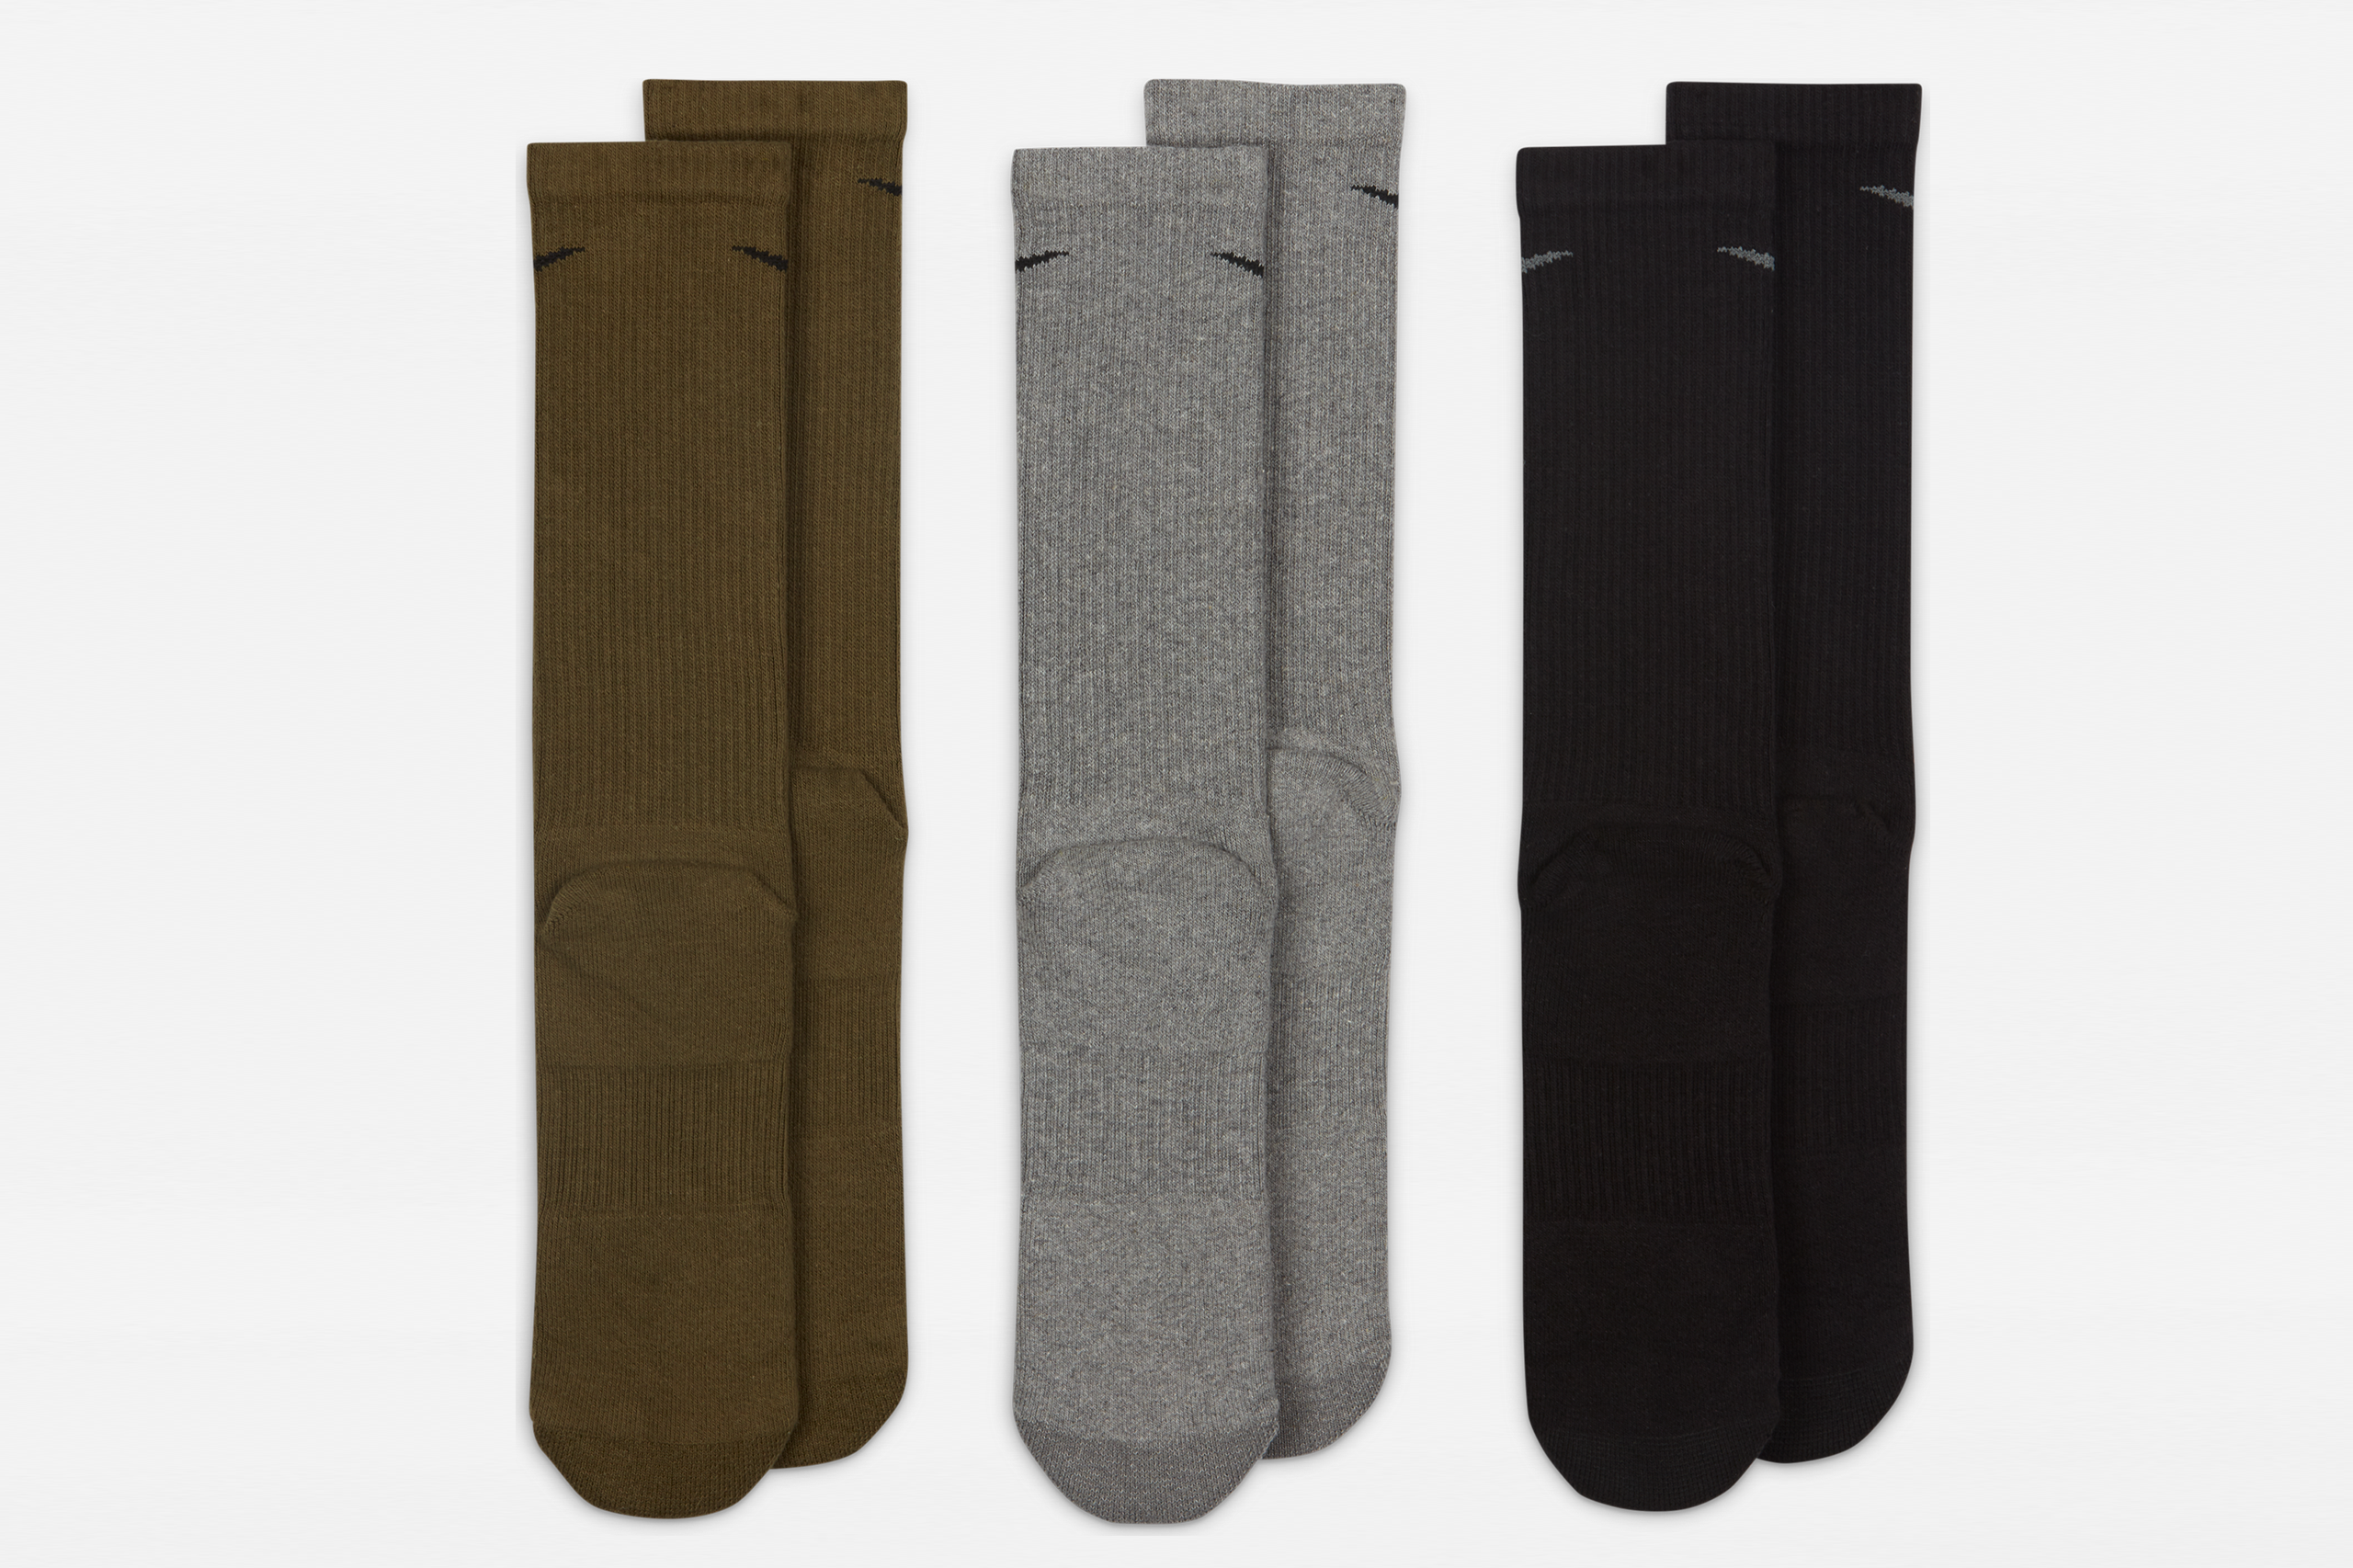 Nike Everyday Cushion Crew Socks Multicolor